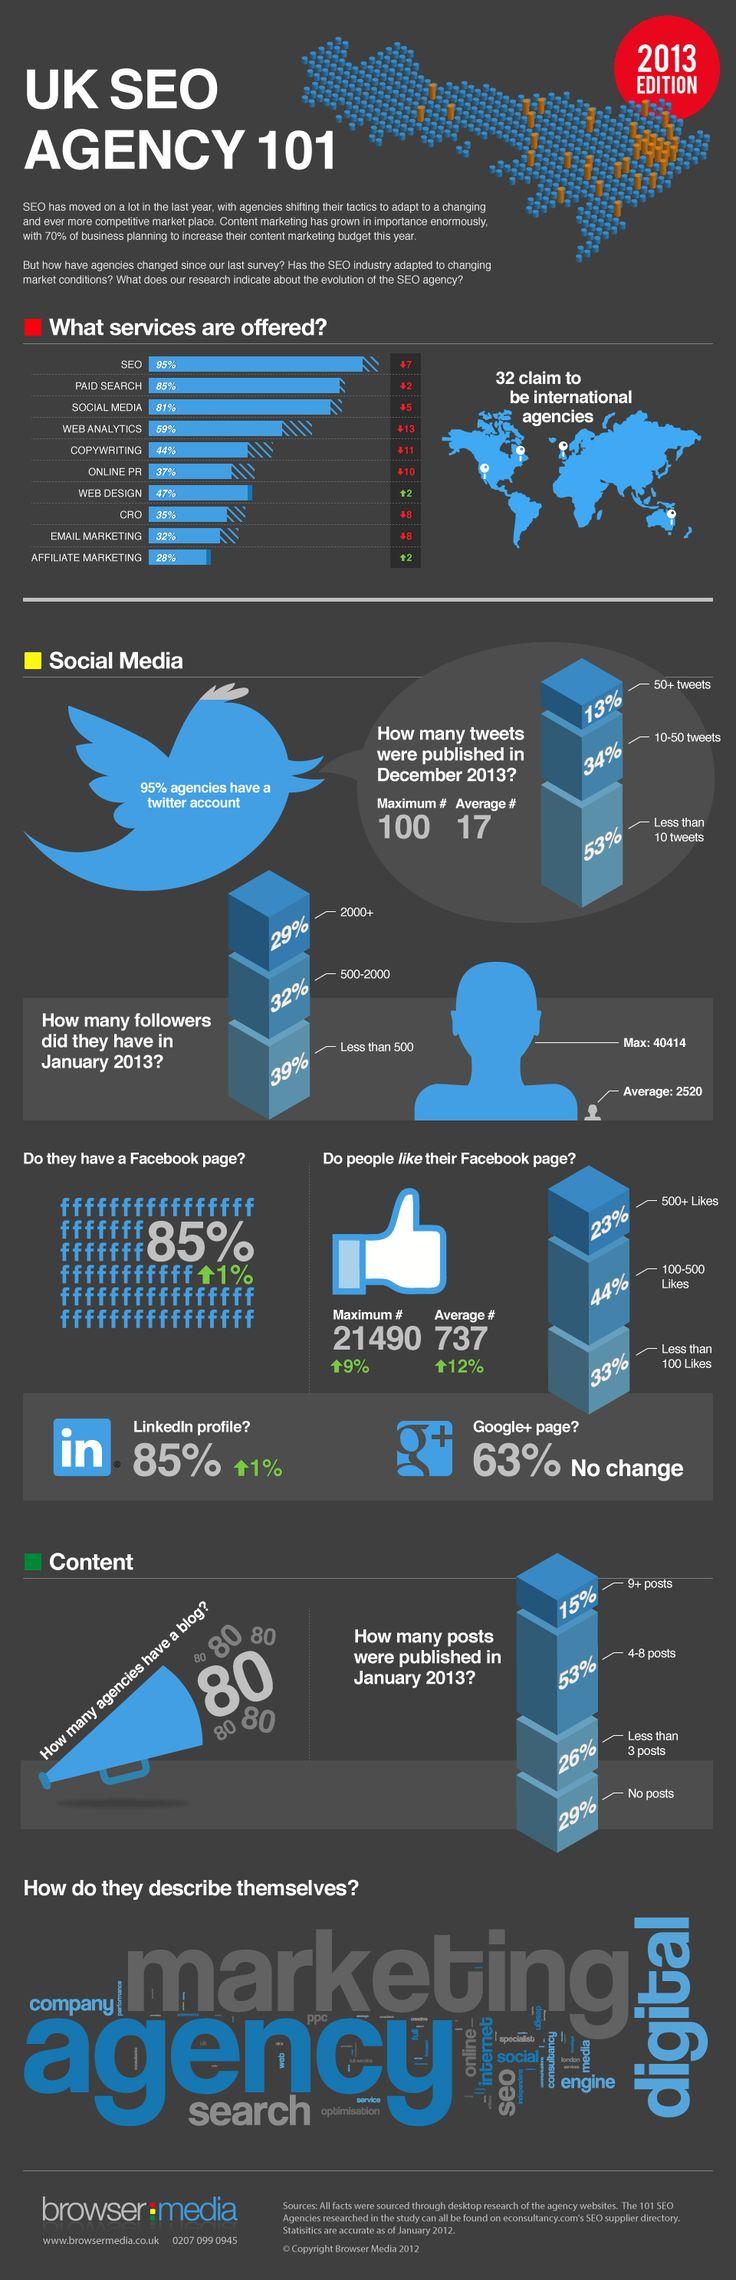 Hoe hebben SEO bureaus social media ingezet? - #infographic #socialmedia